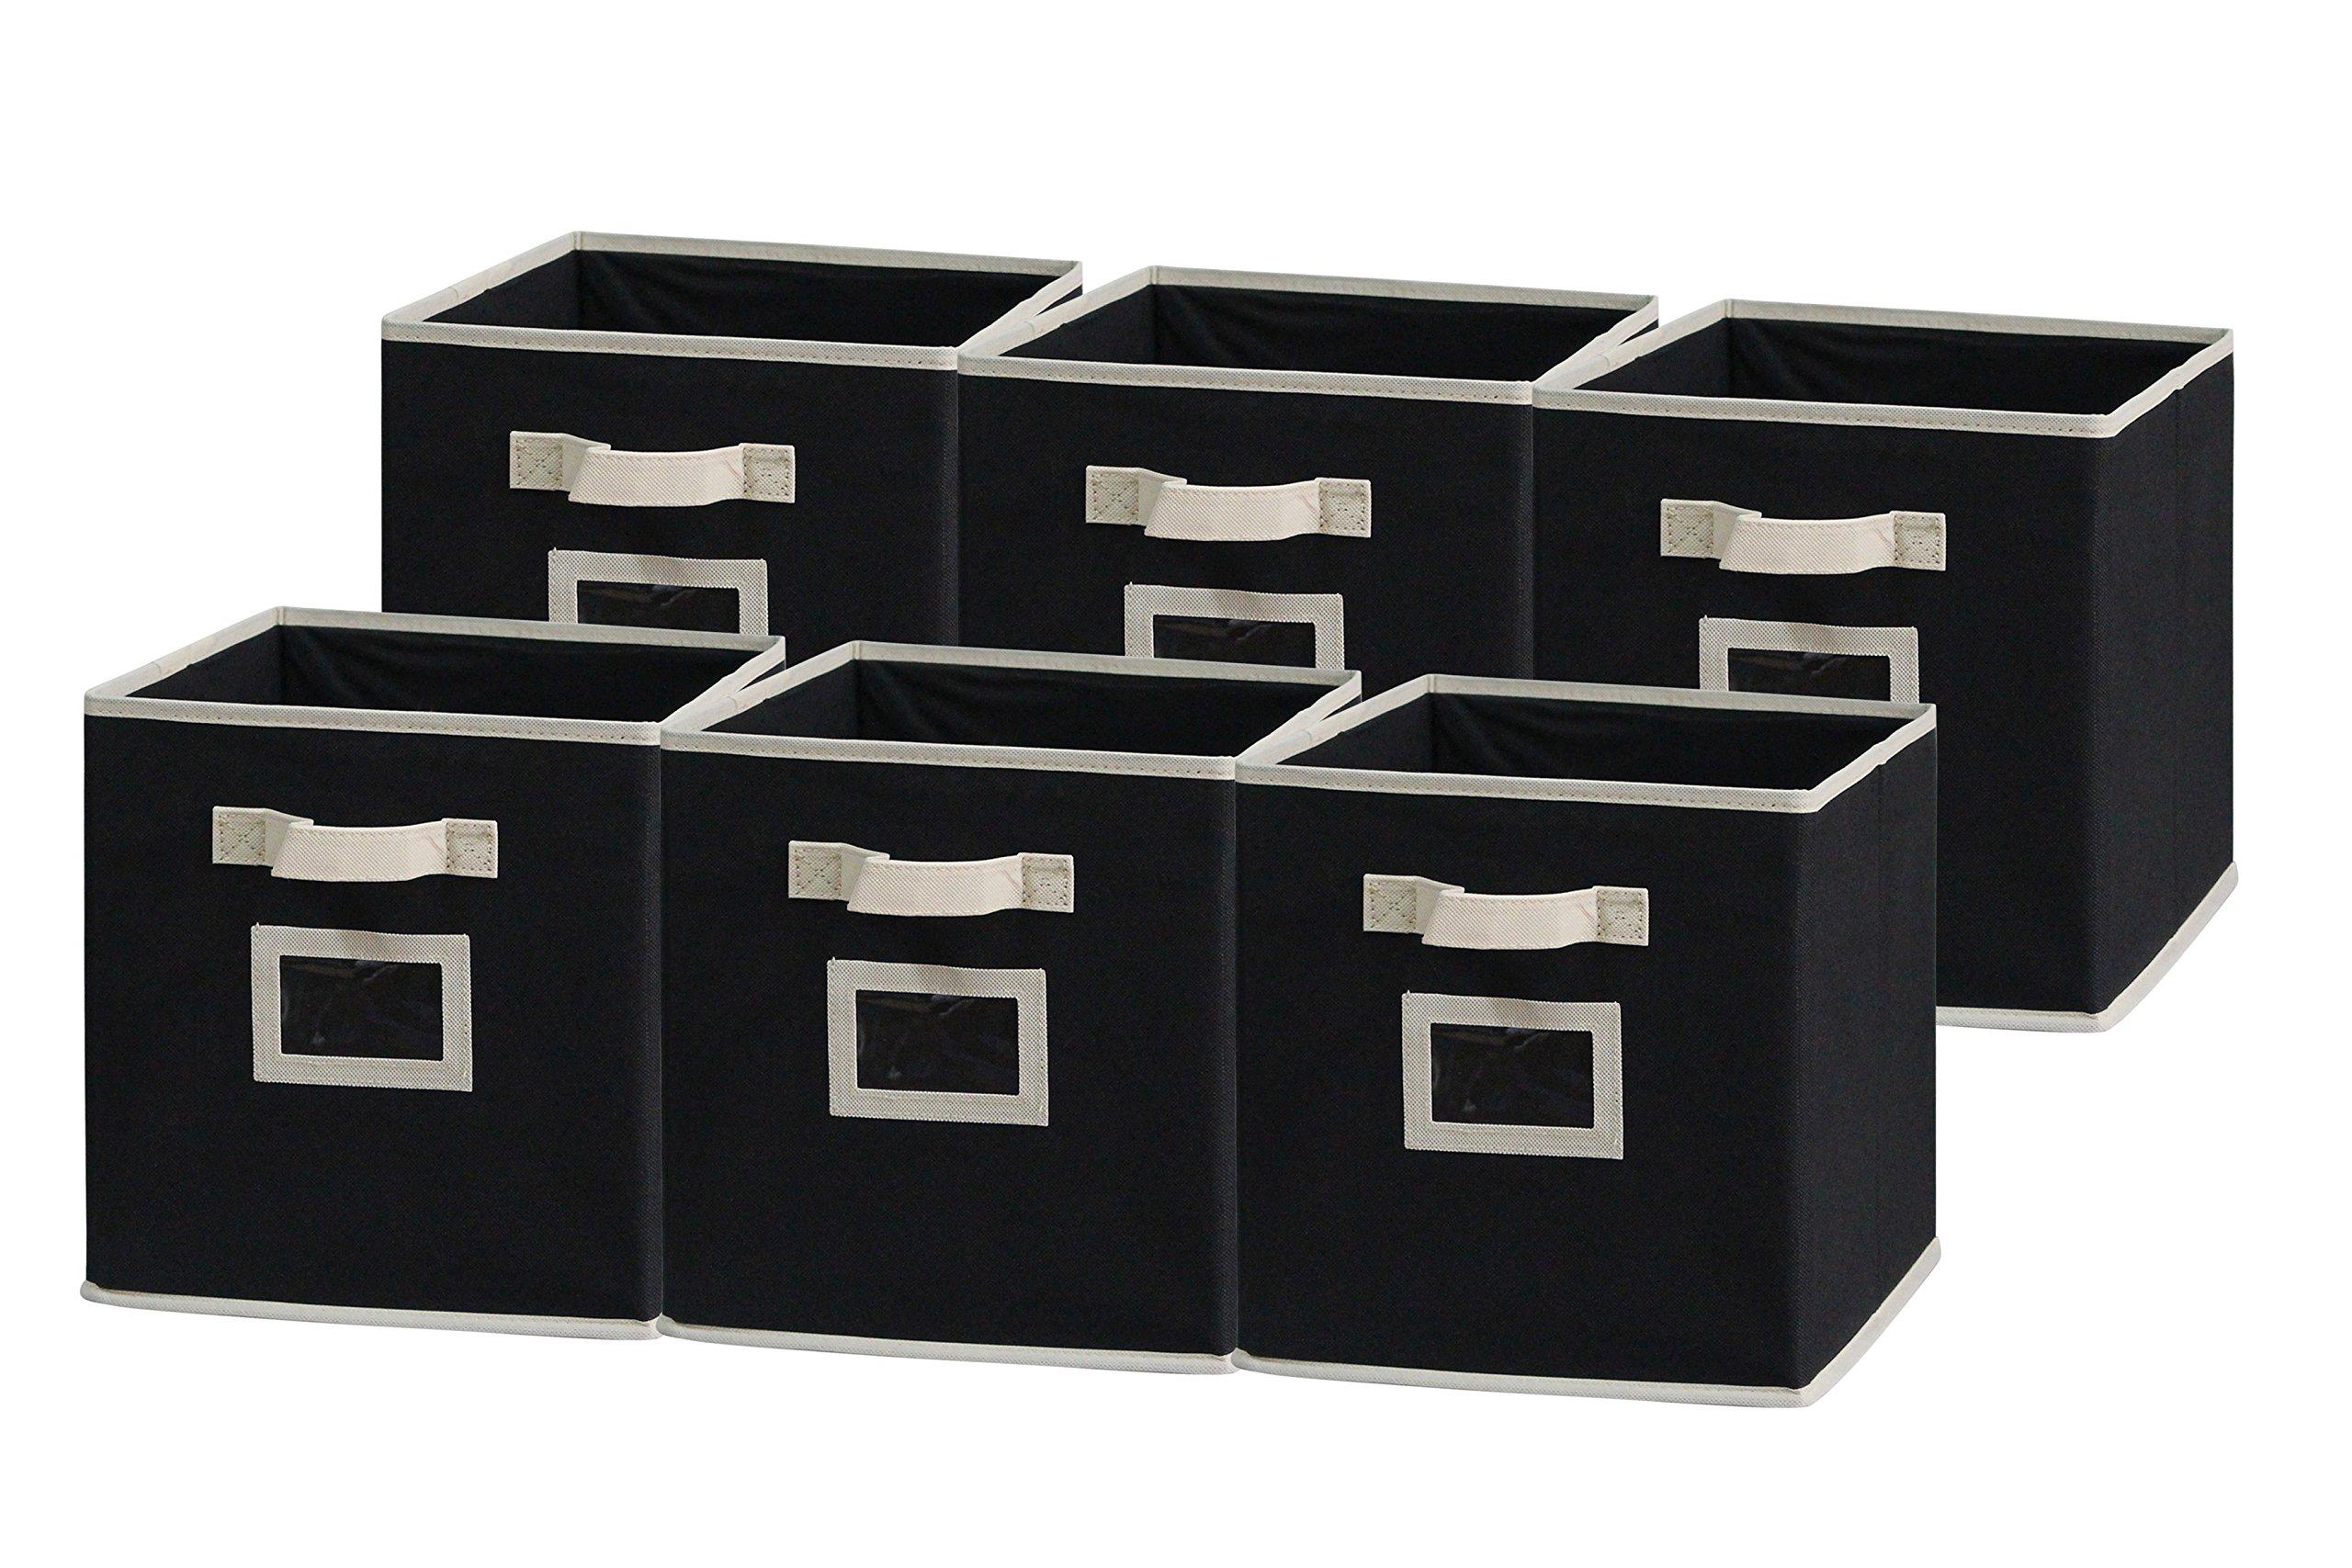 Sodynee Foldable Cloth Storage Cube Basket Bins Organizer Containers Drawers, 6 Pack, Beige/Black by Sodynee